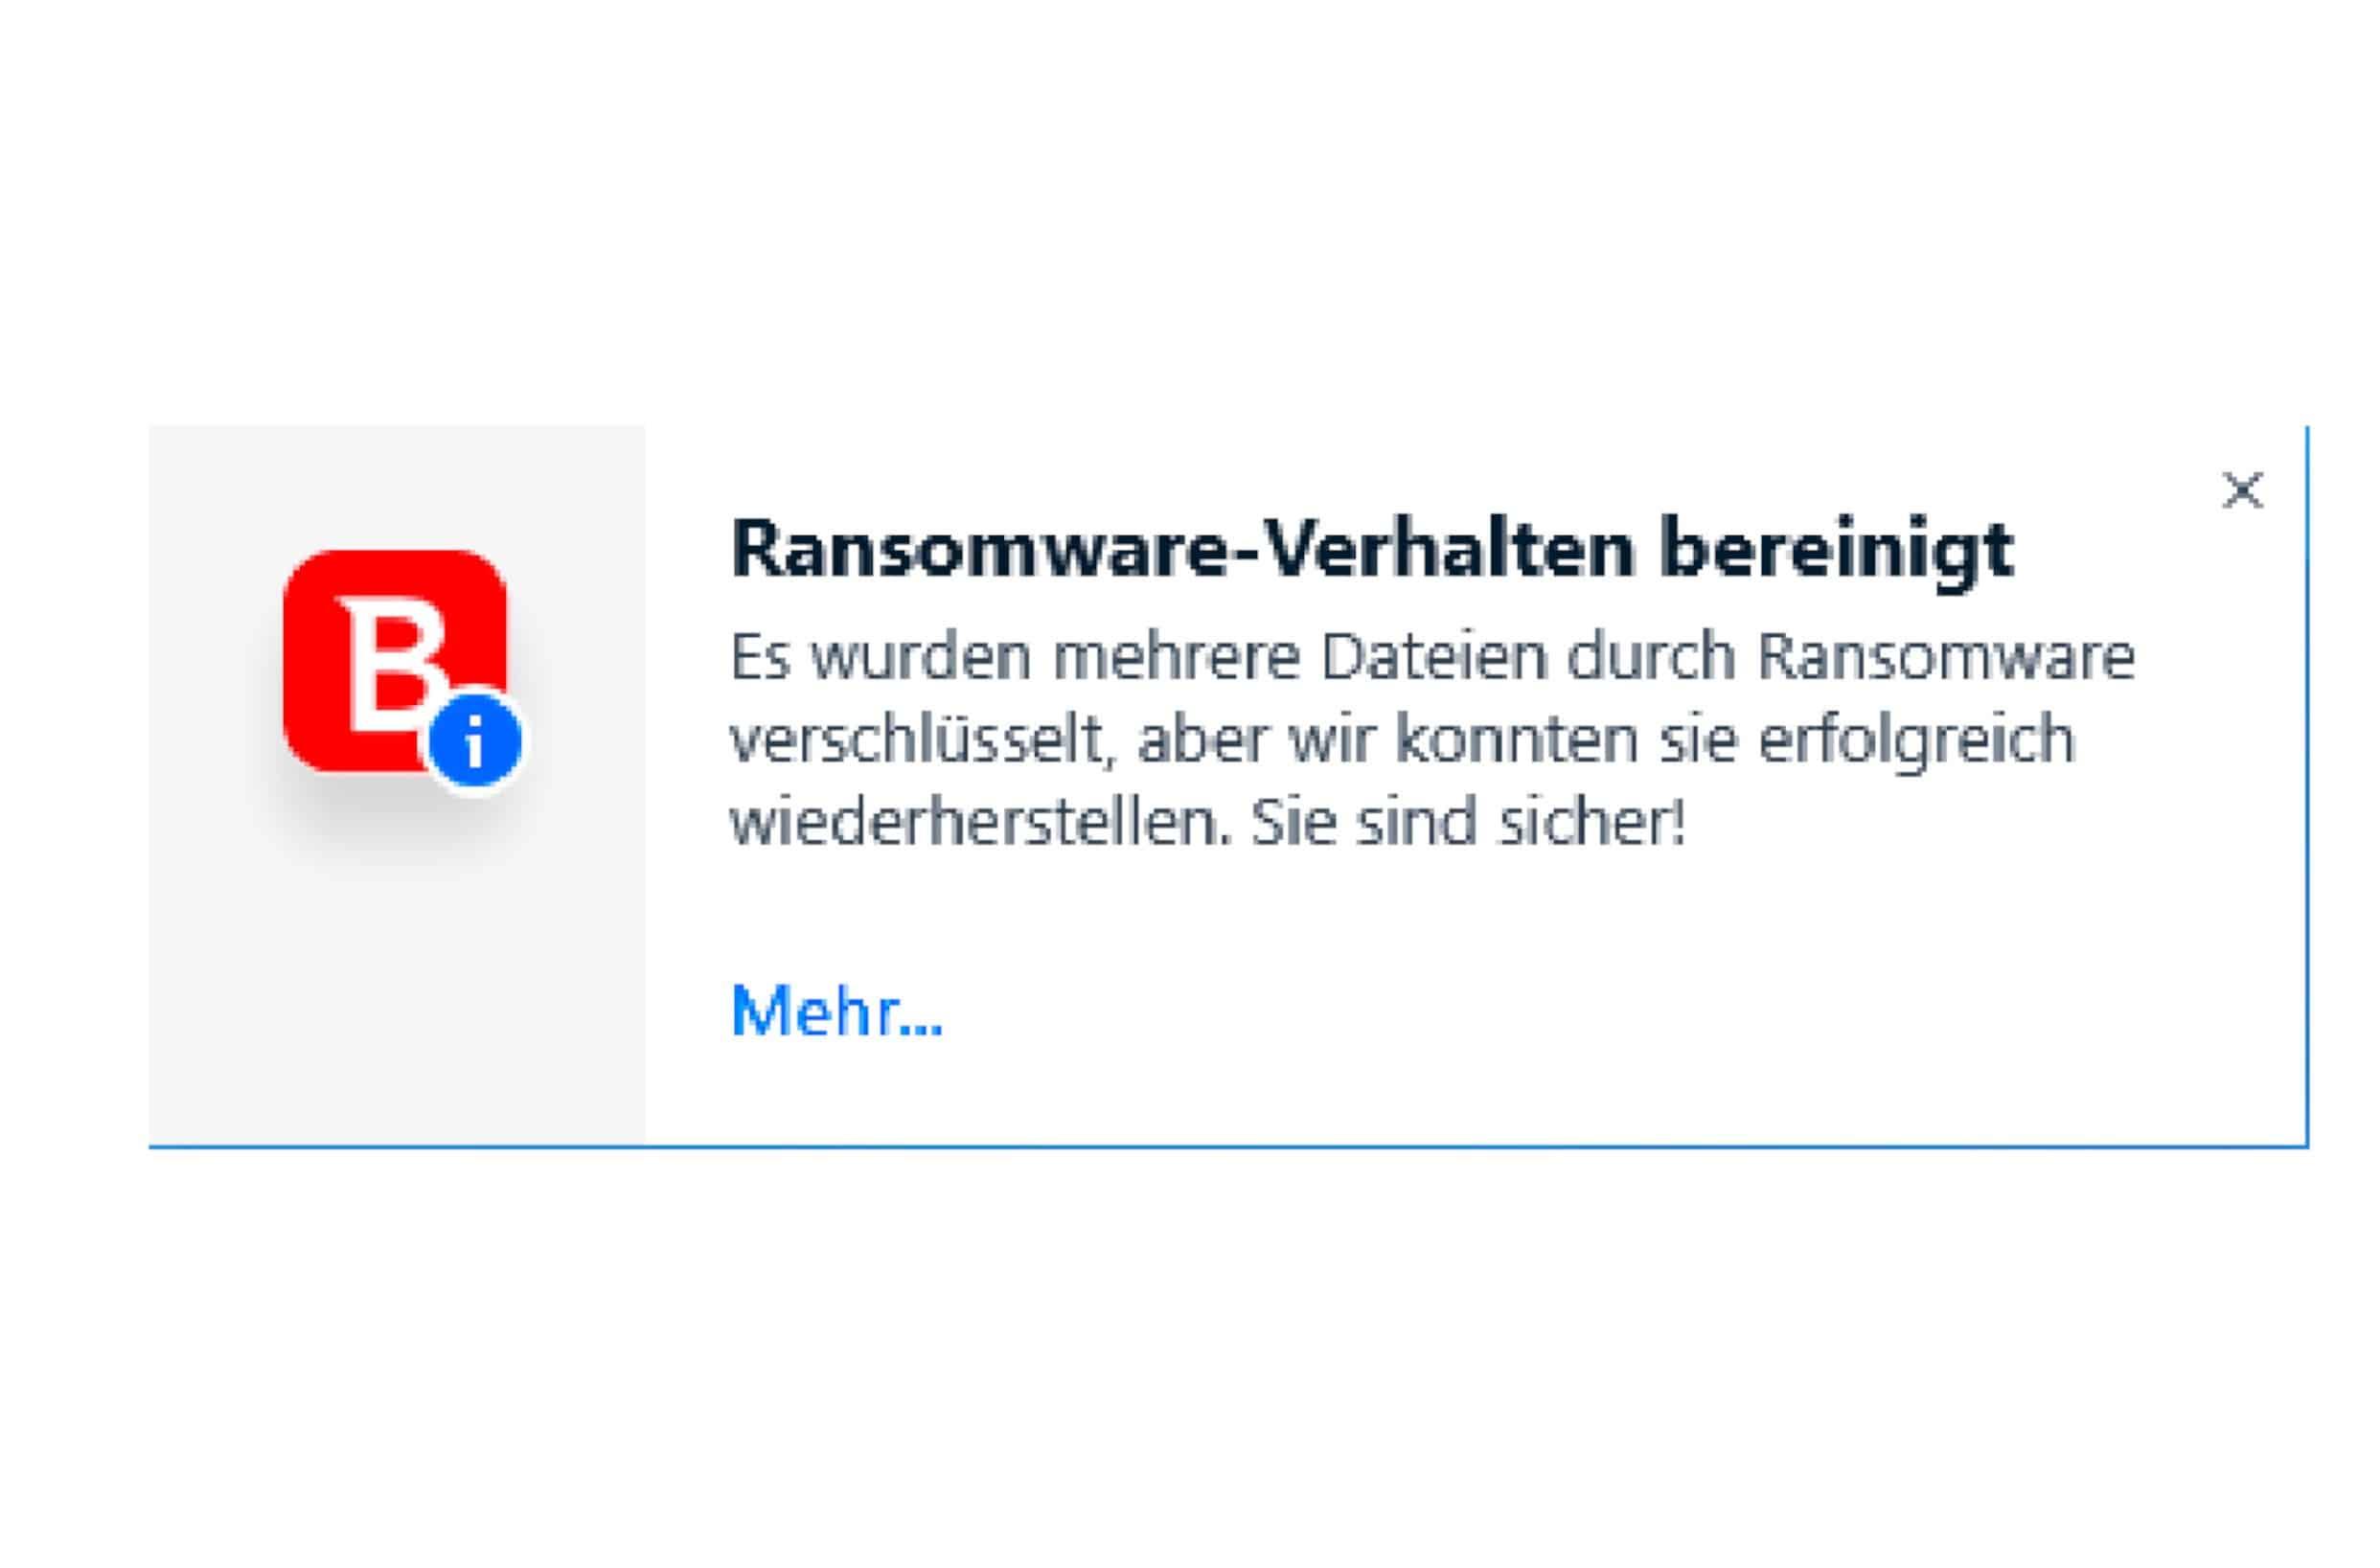 Bitdefender_Meldung Ransome